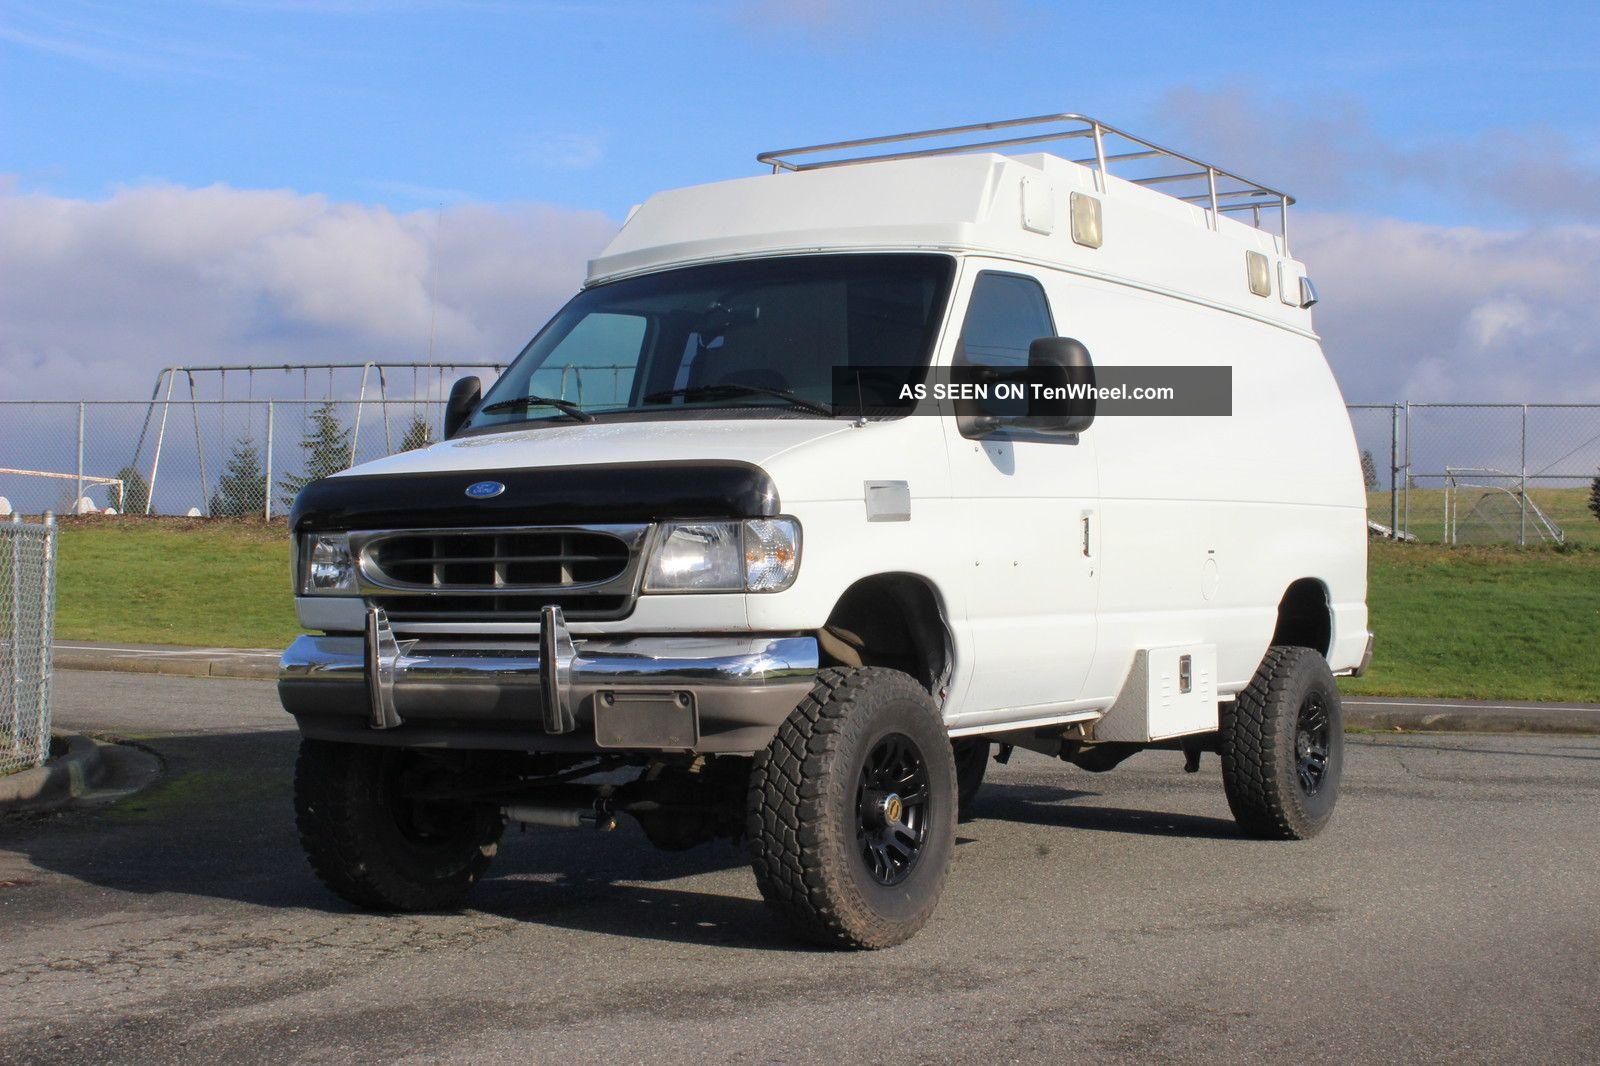 1995 ford e350 7 3 powerstroke turbo diesel 4x4 van. Black Bedroom Furniture Sets. Home Design Ideas